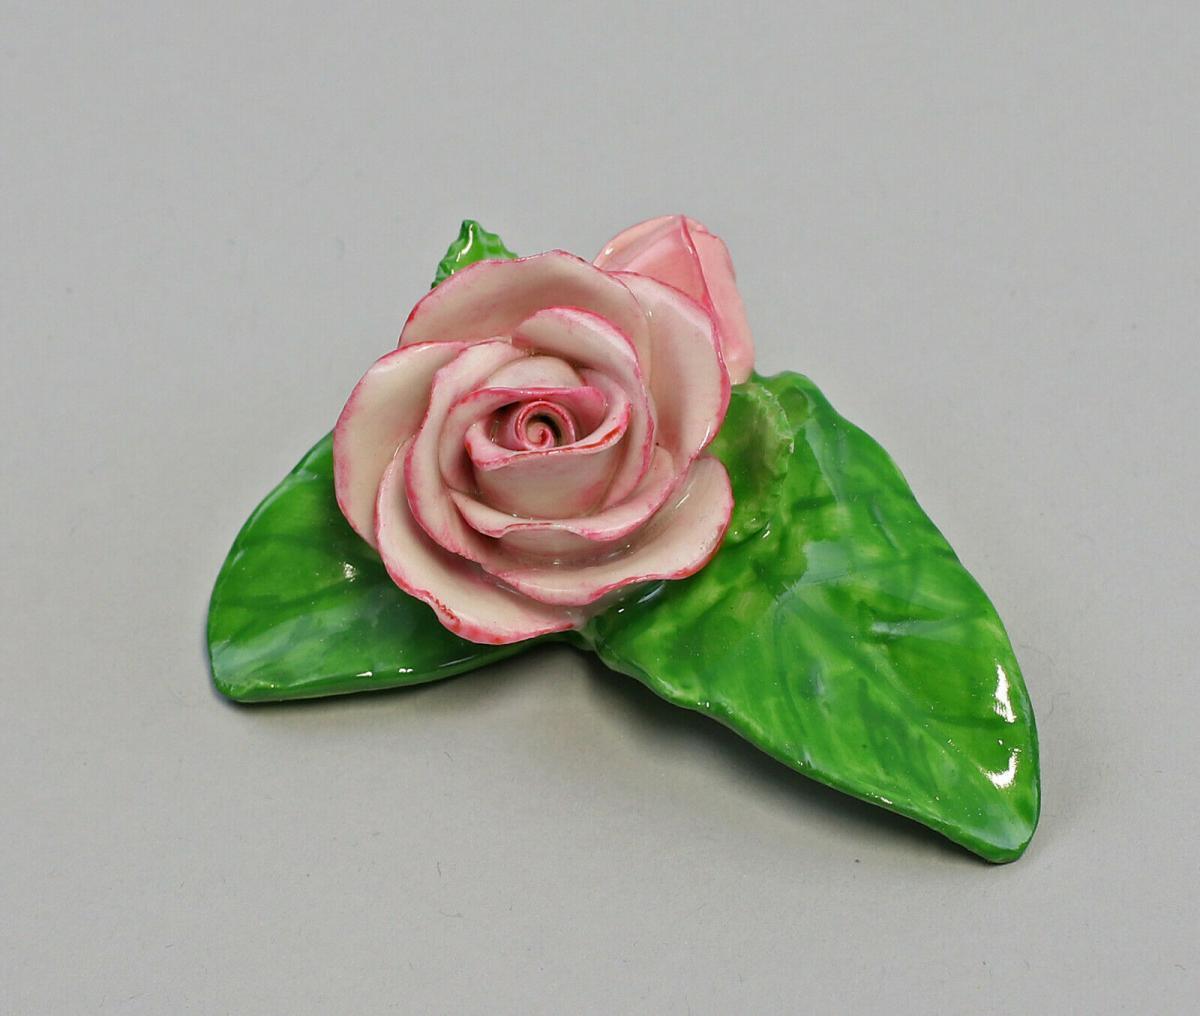 9959612 Porzellan Figur Tischblume Rose Knospe rose Ens 6,5x5x3cm